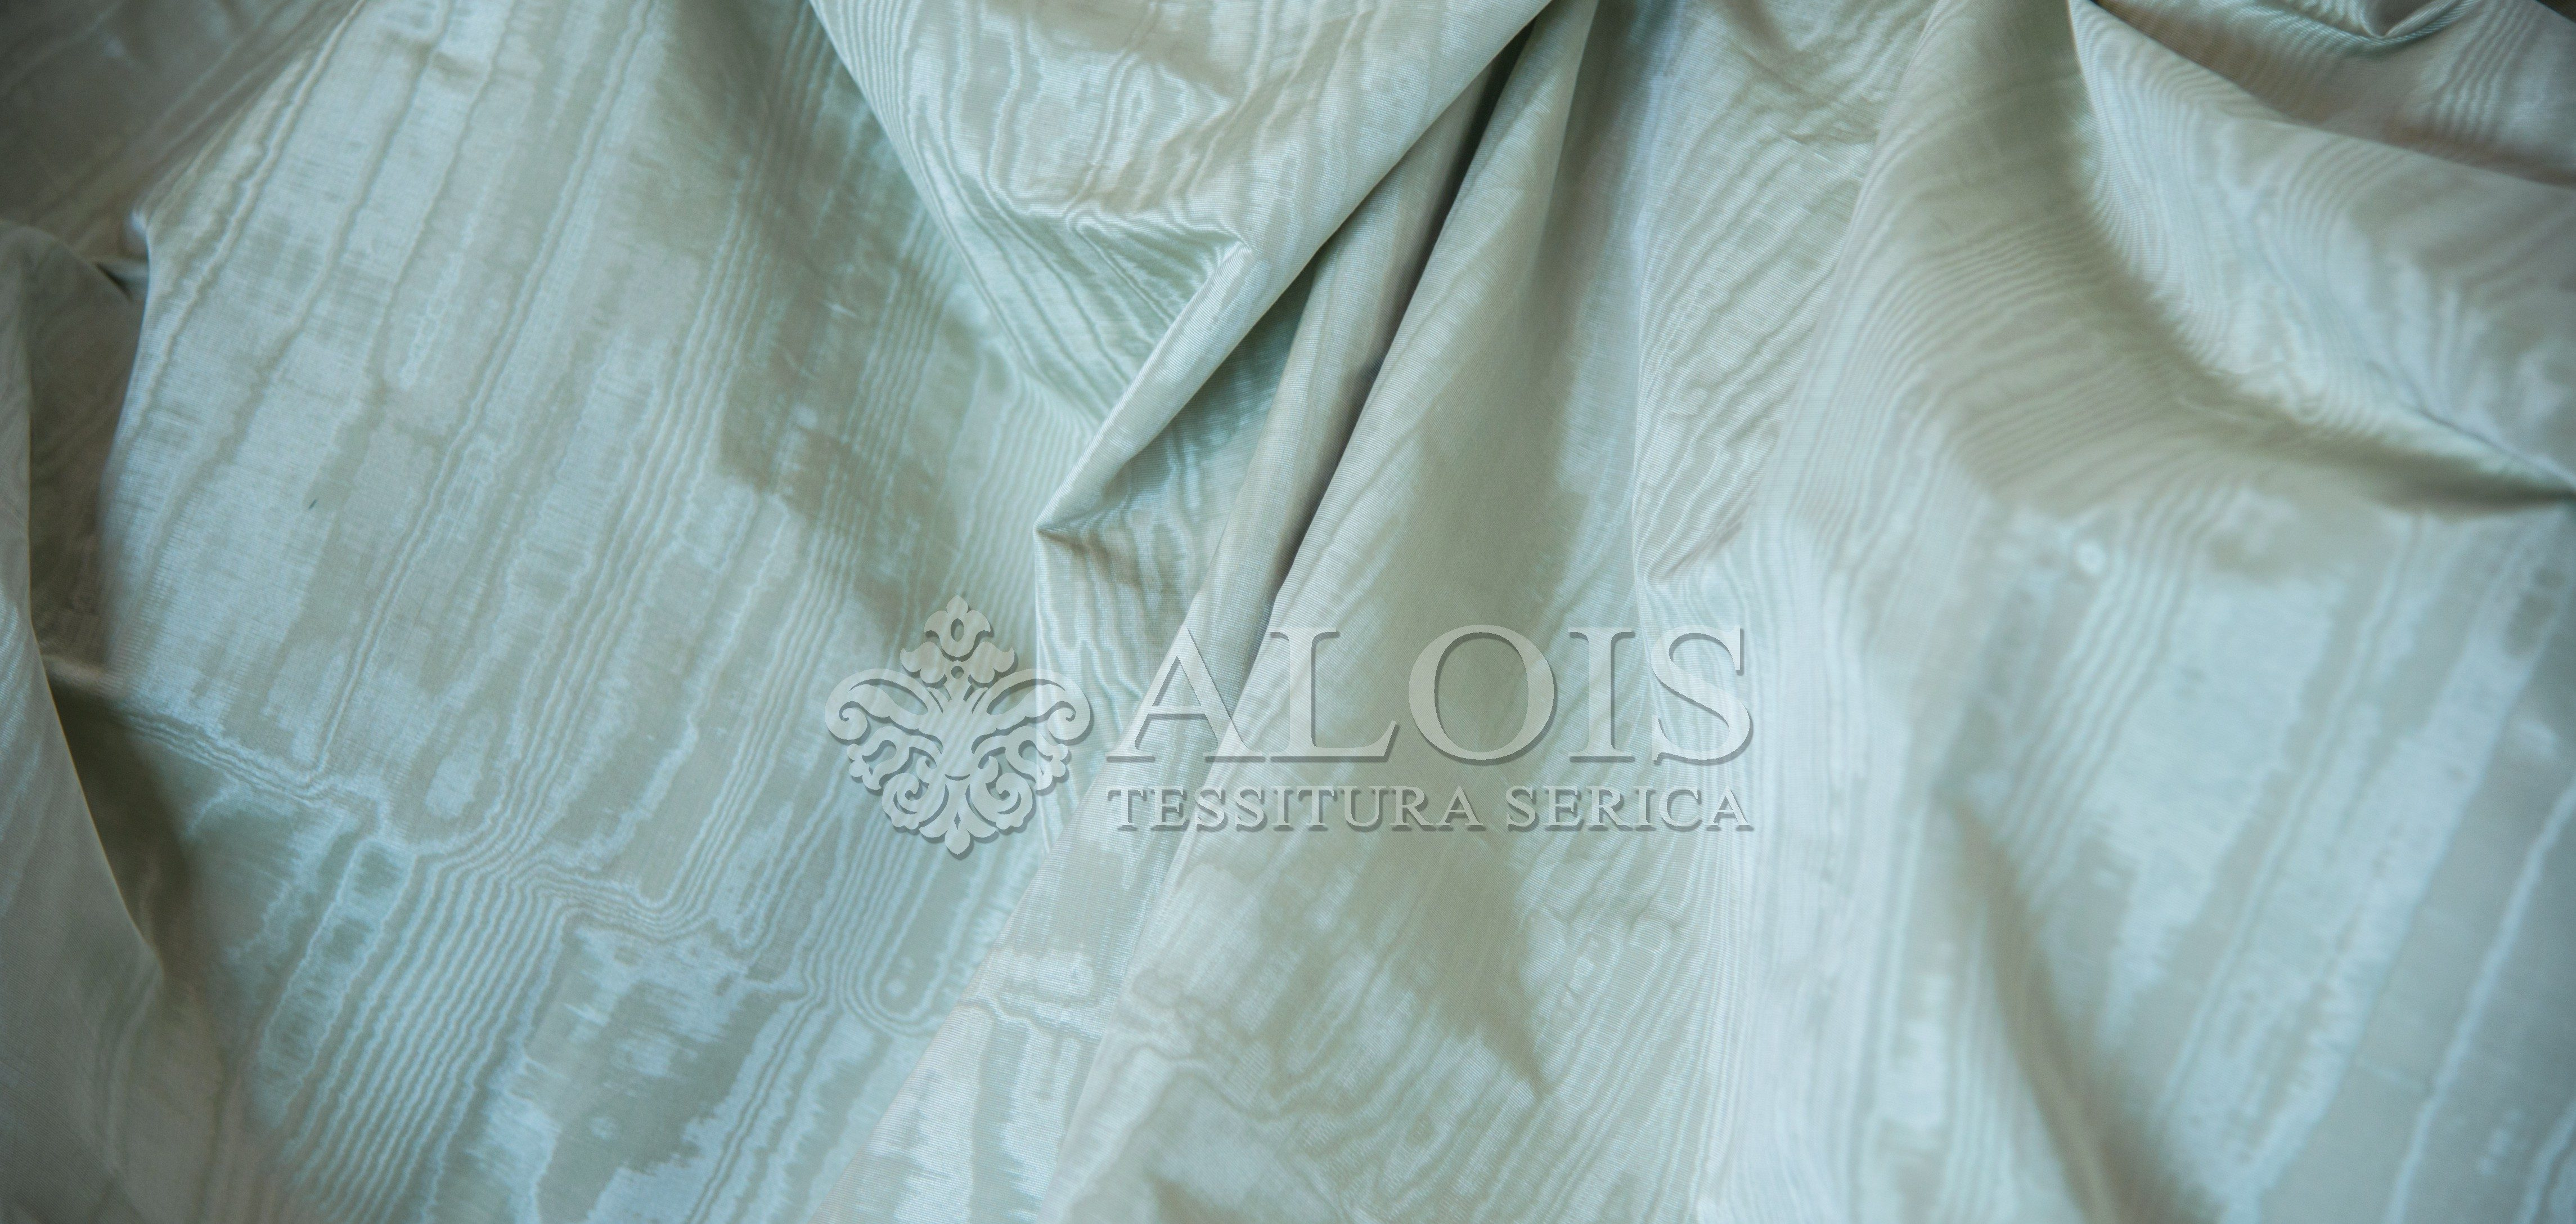 Alois tessitura serica